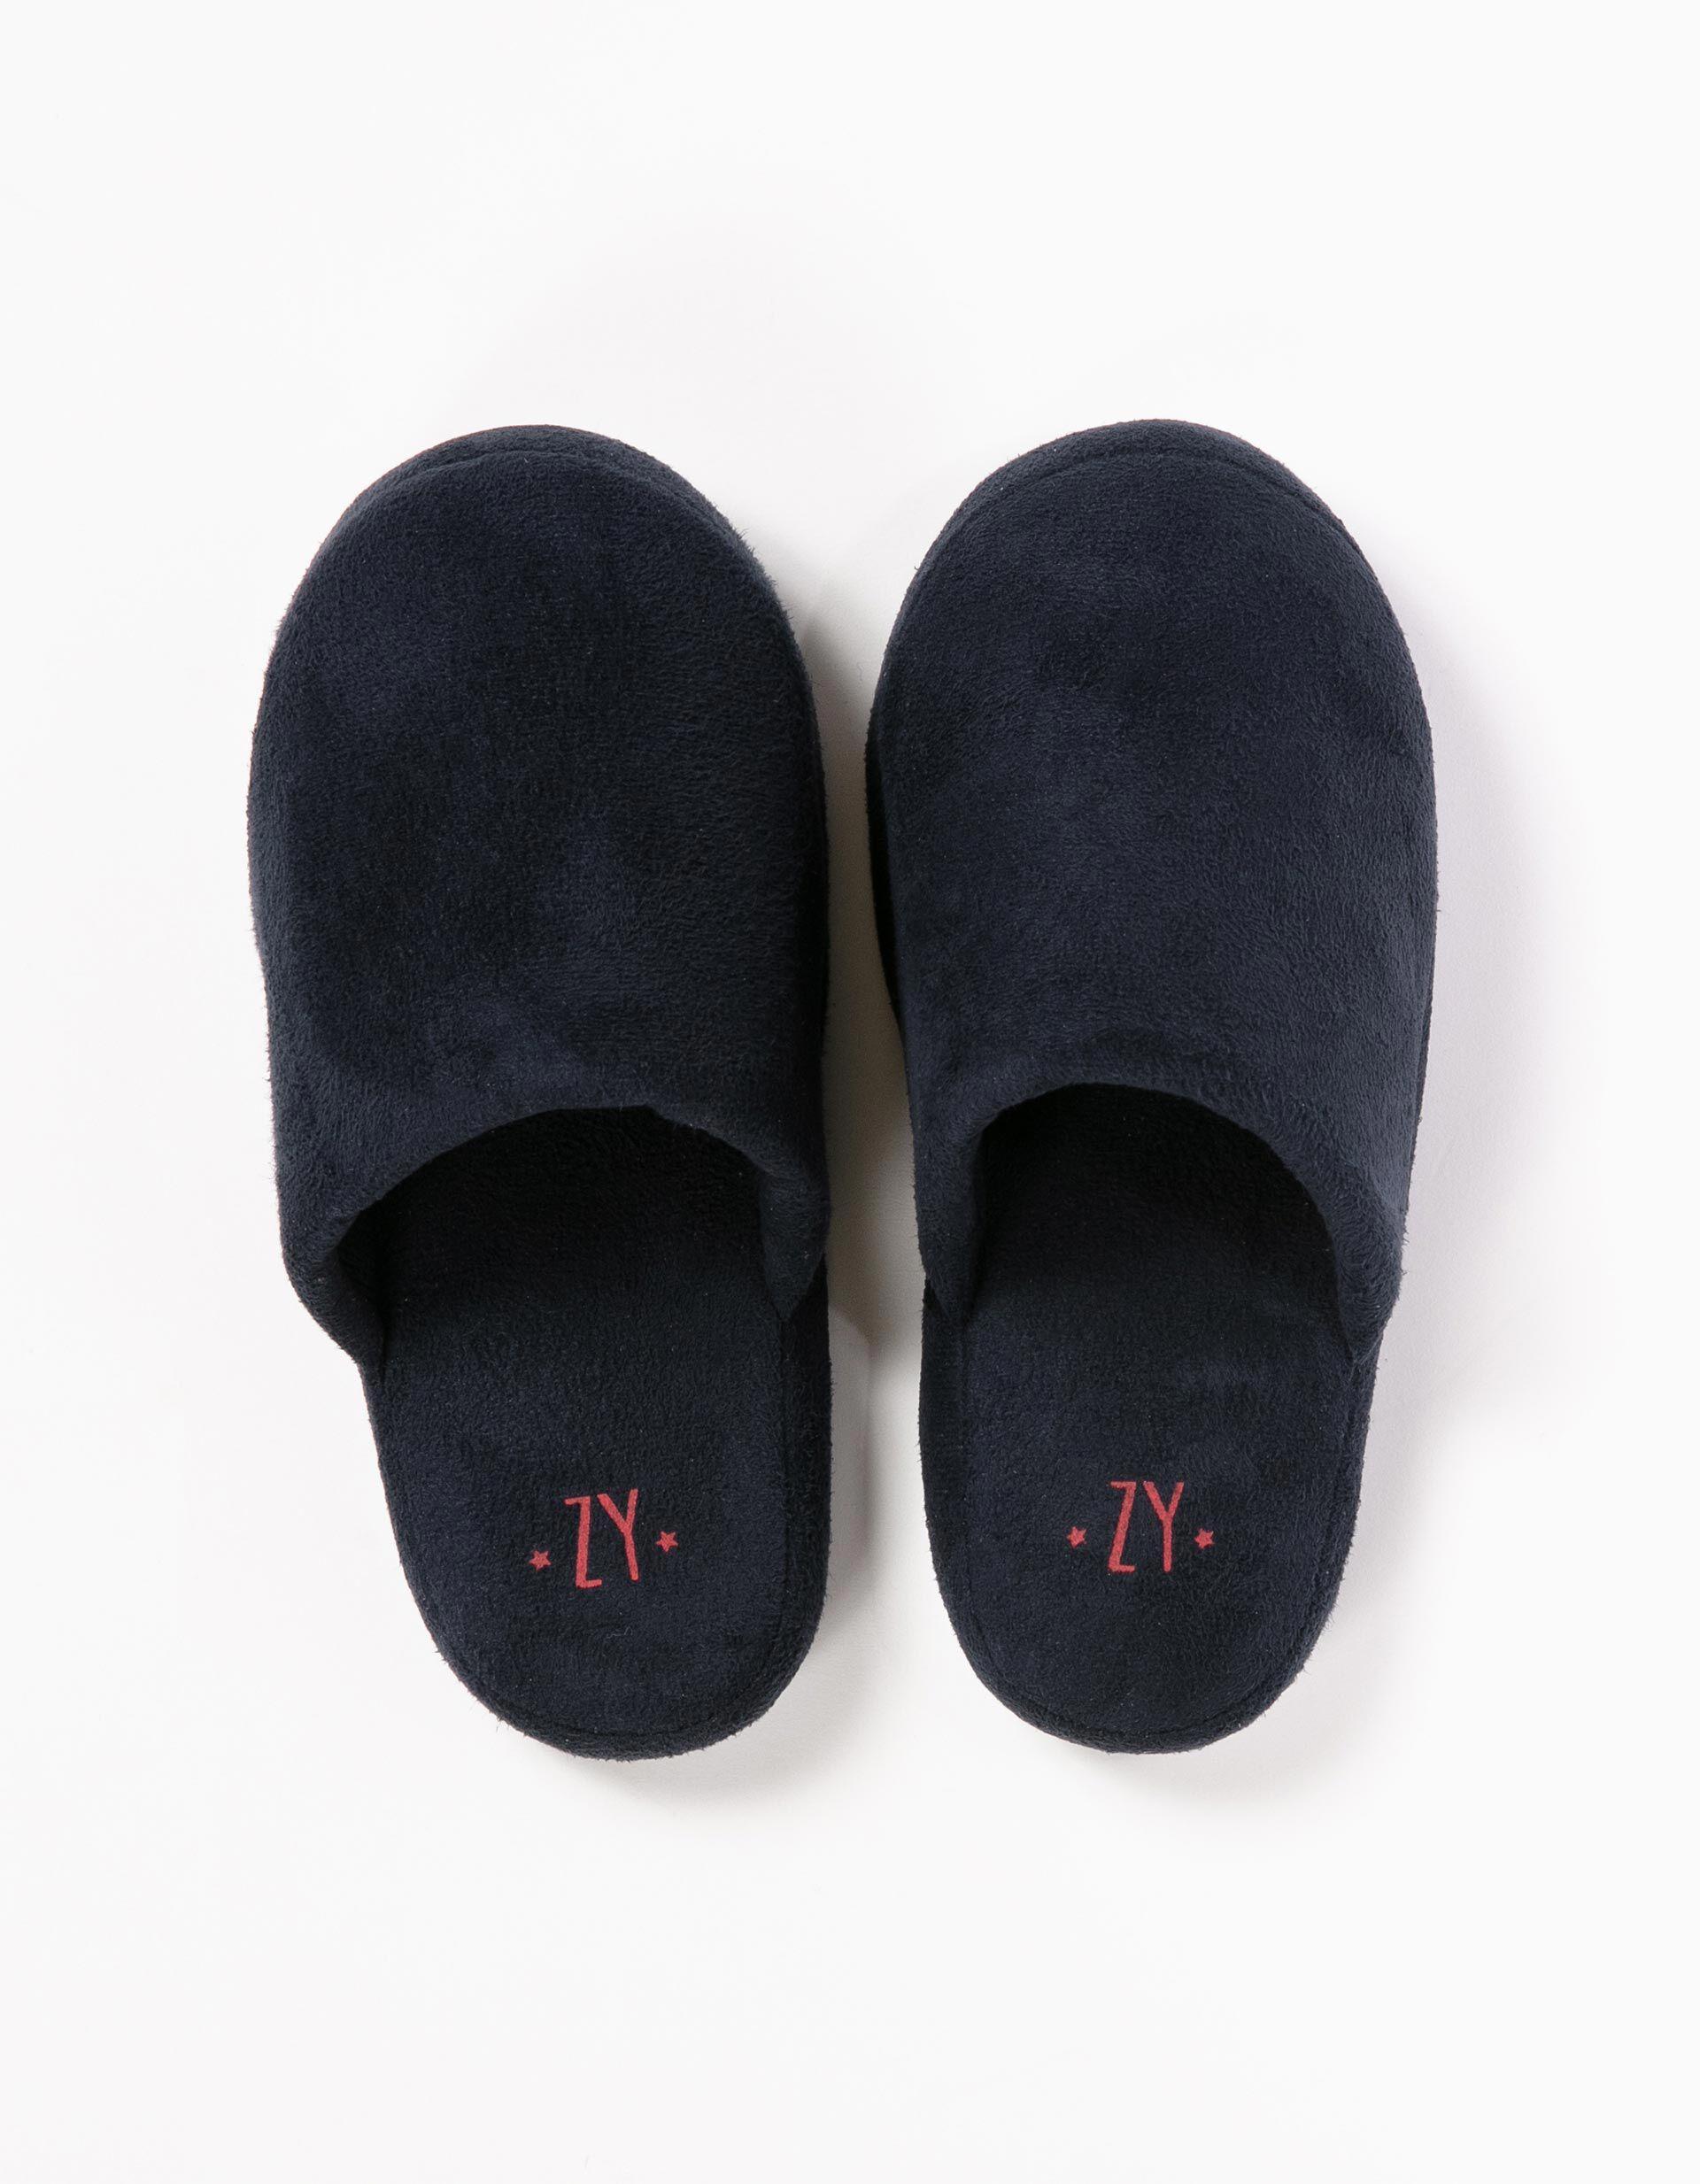 Dark Blue Bedroom Slippers | MO Online